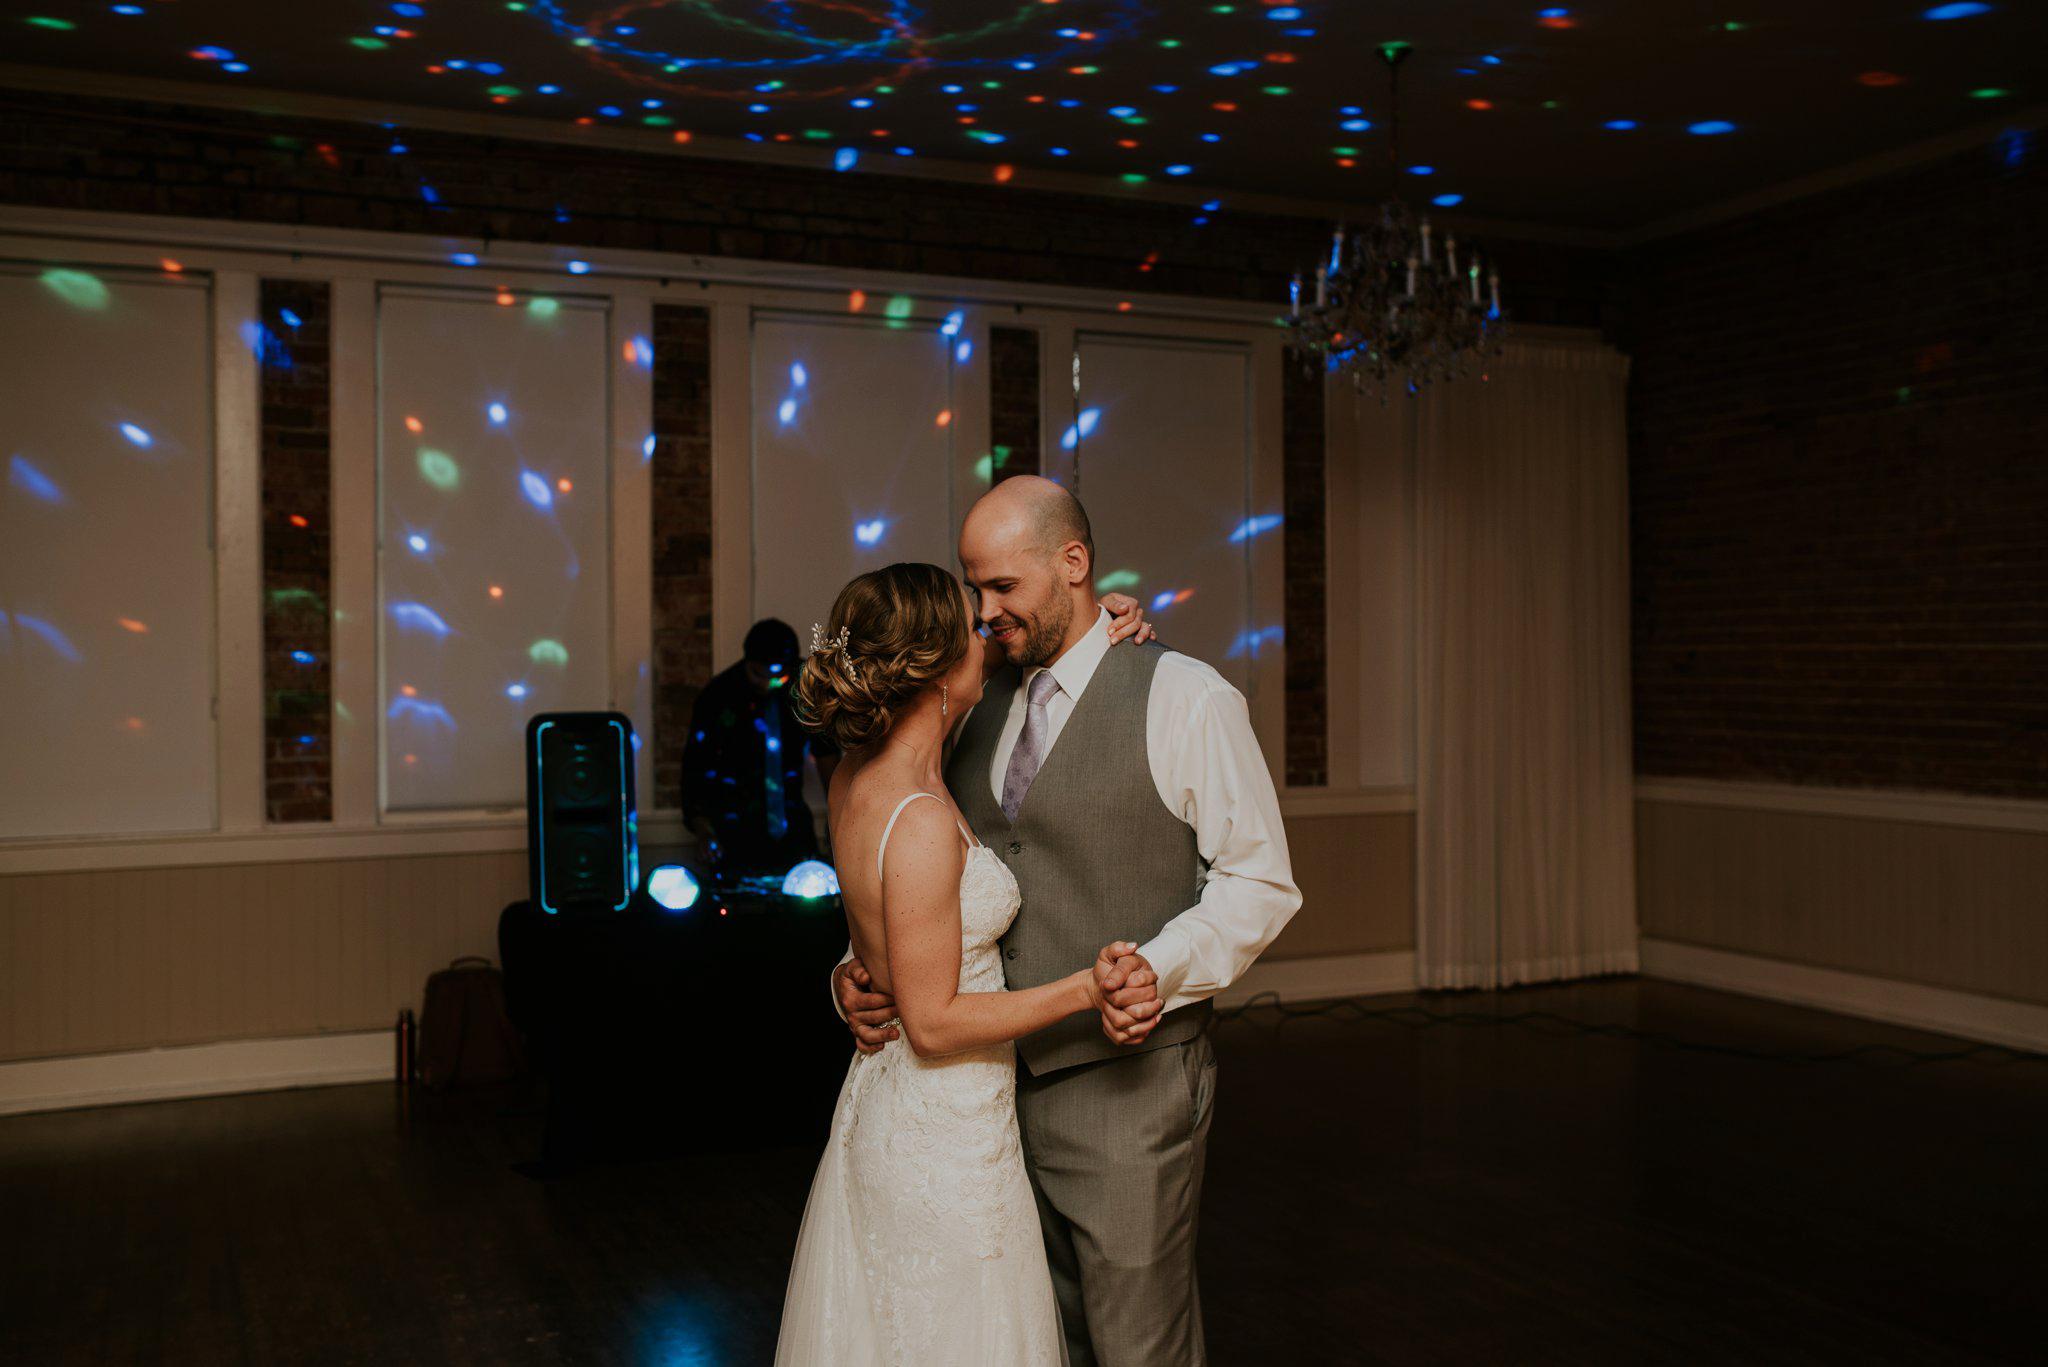 hollywood-school-house-wedding-seattle-photographer-caitlyn-nikula-110.jpg